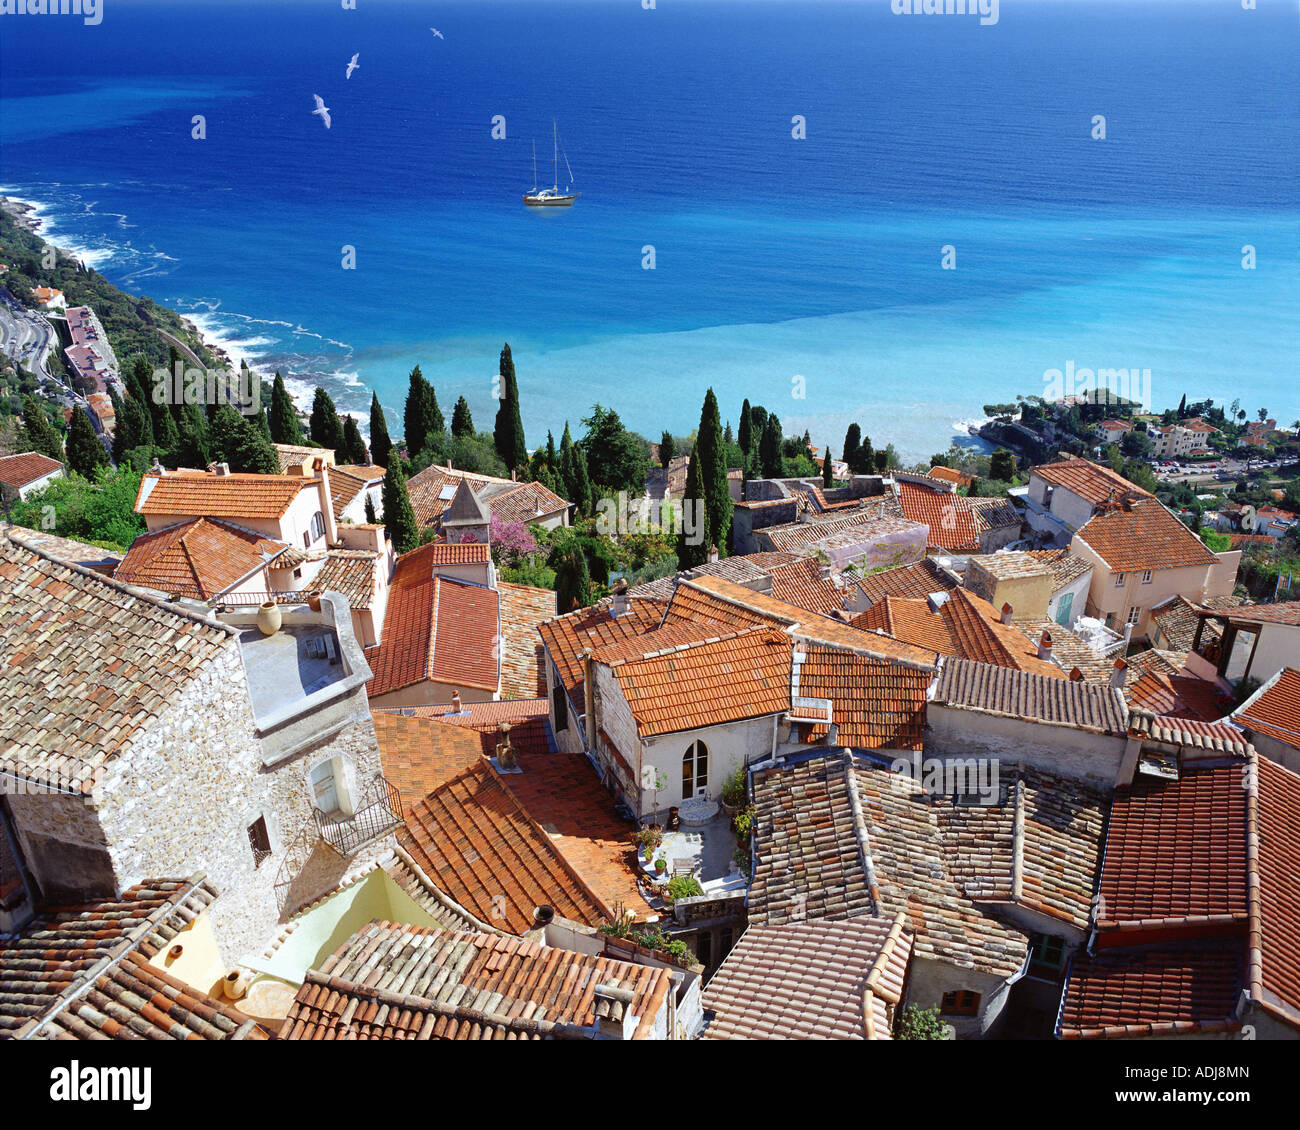 FR - COTE D'Azur: Pueblo de Roquebrune Cap Martin Imagen De Stock